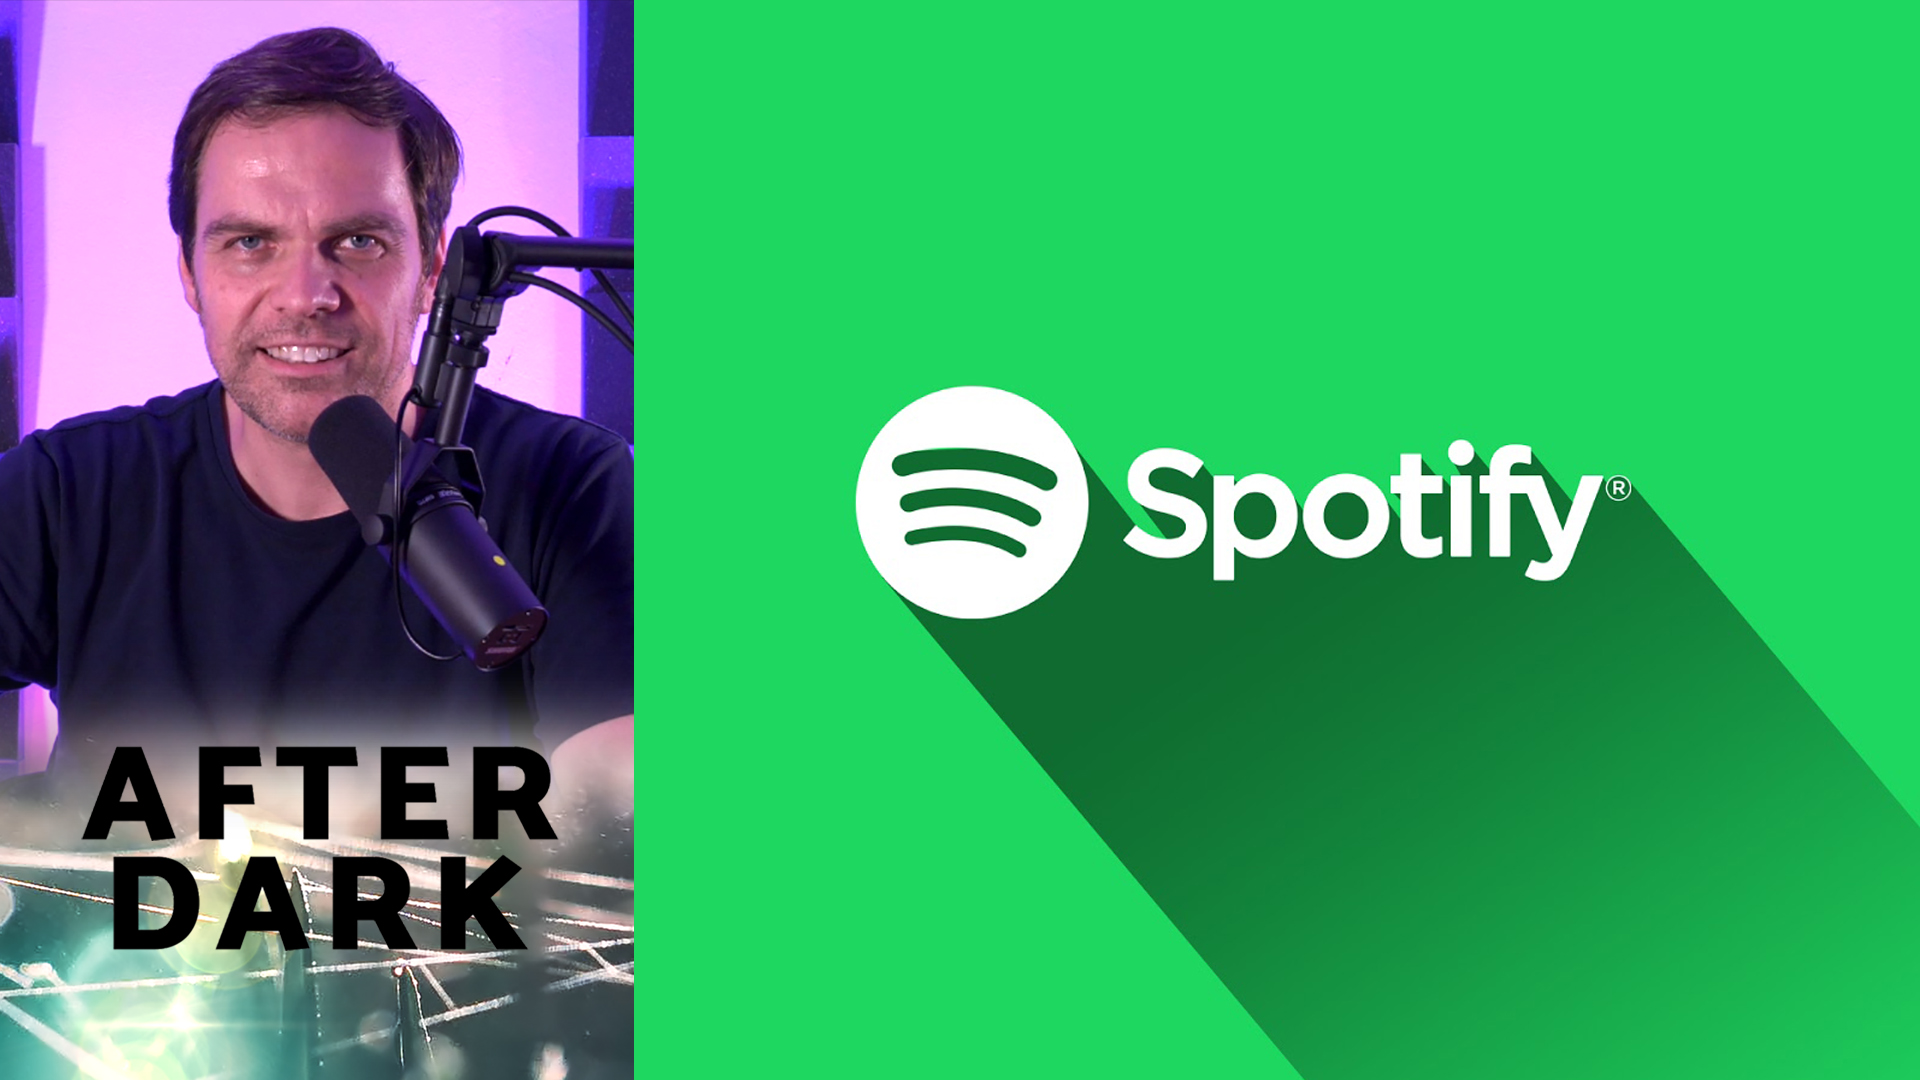 Spotify - After Dark